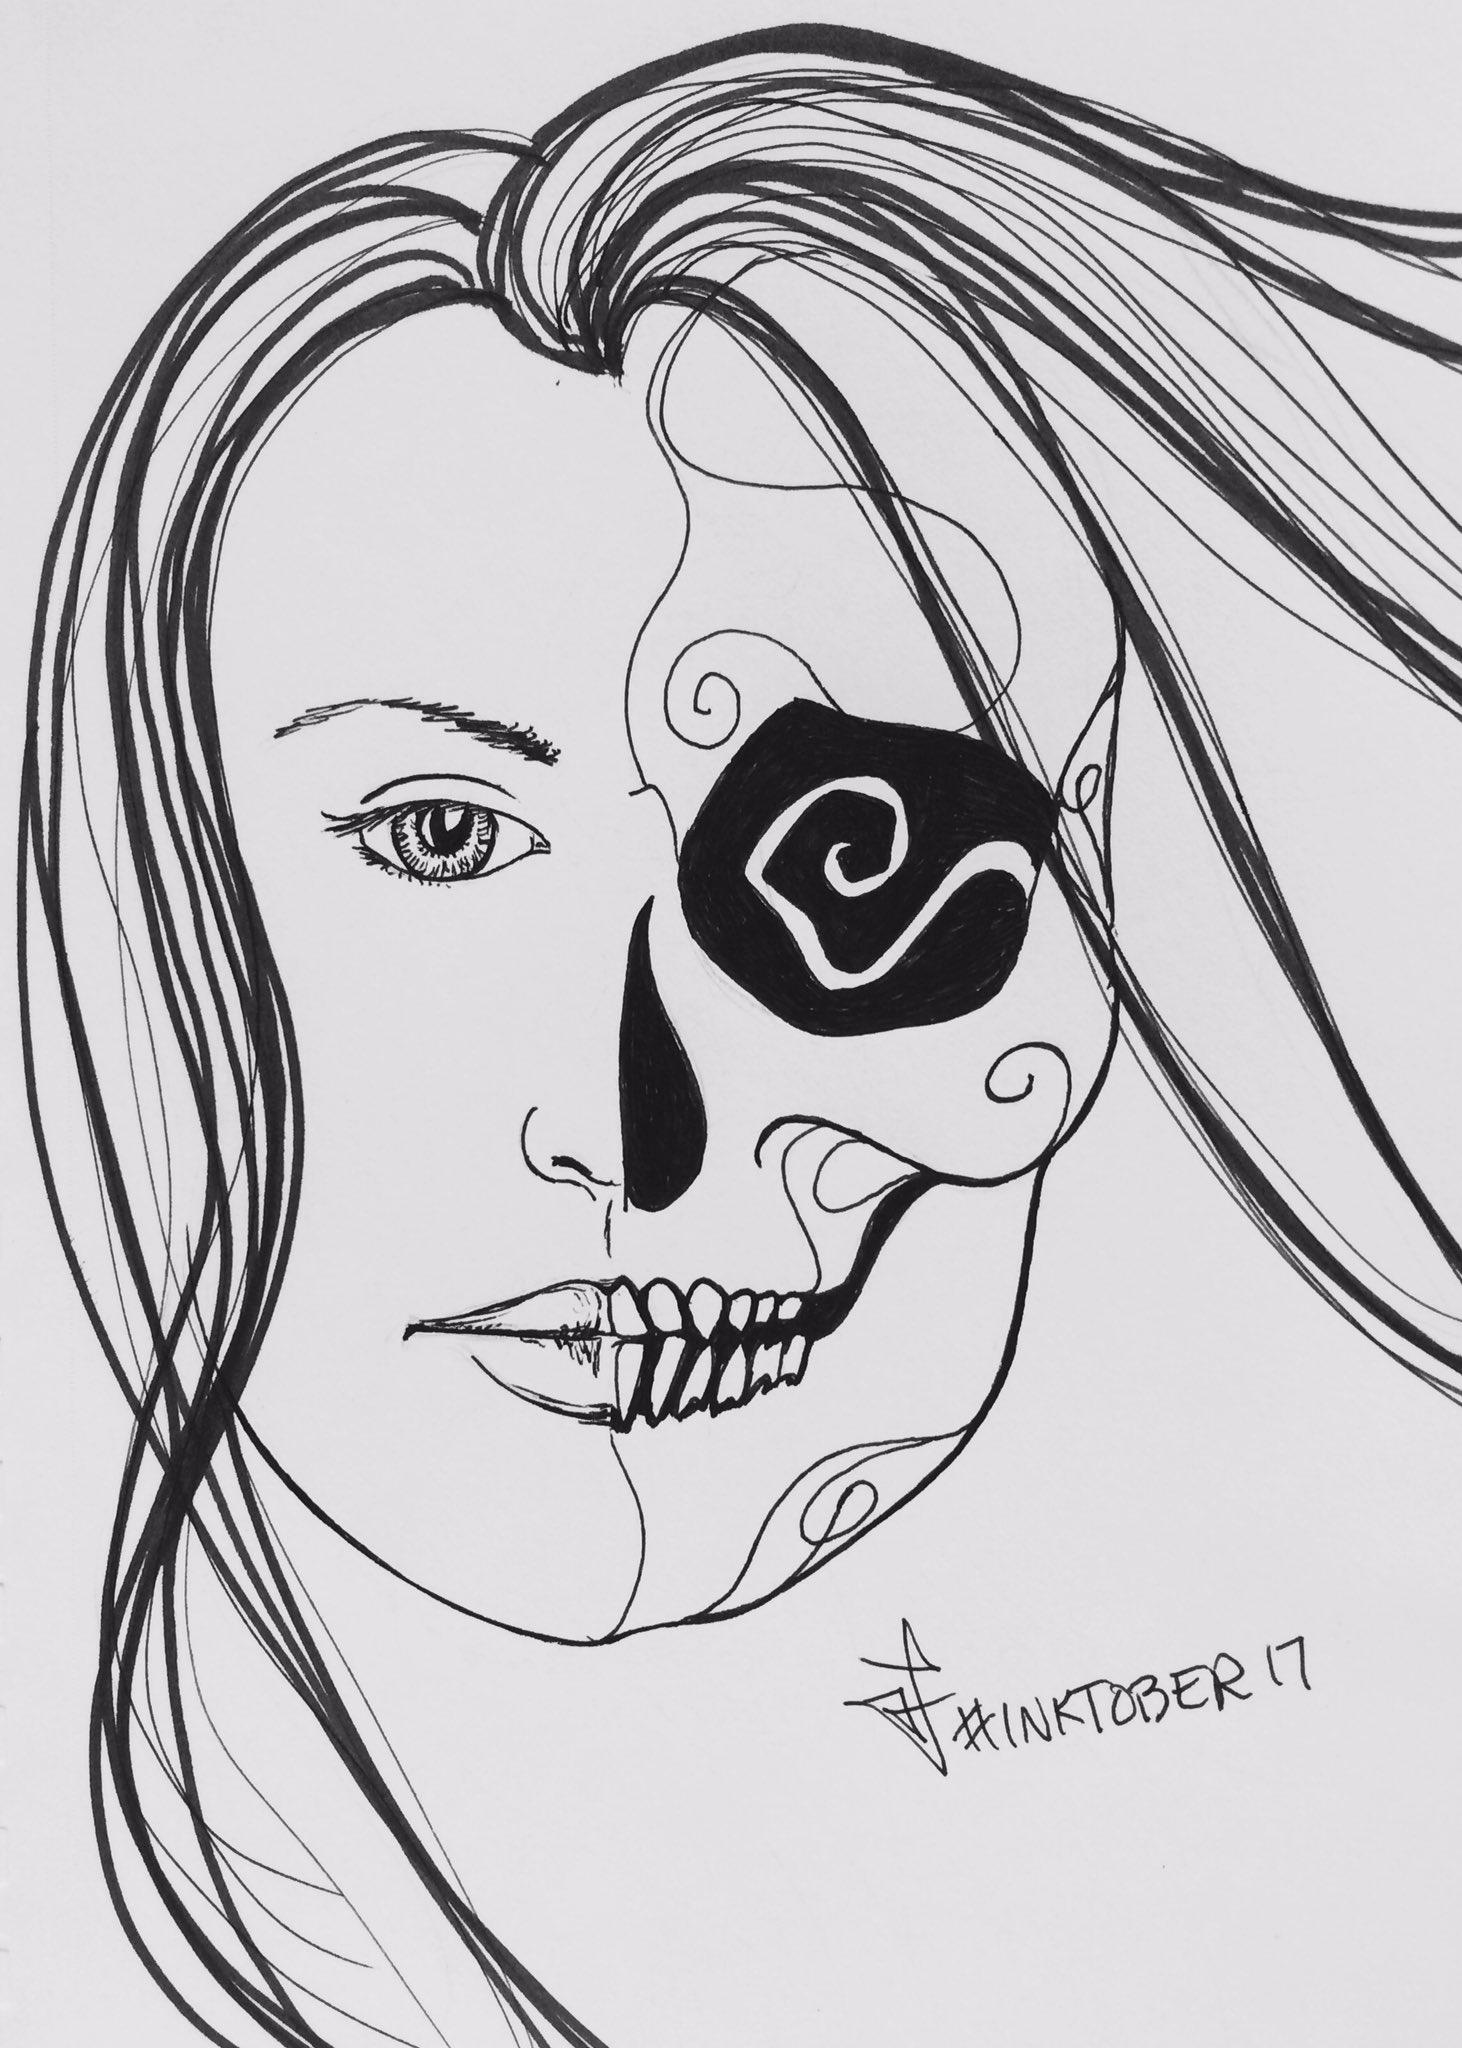 Day 17 #inktober #sketch #skull #meh #forgotattachmentagain!! https://t.co/WSyY58cq8D